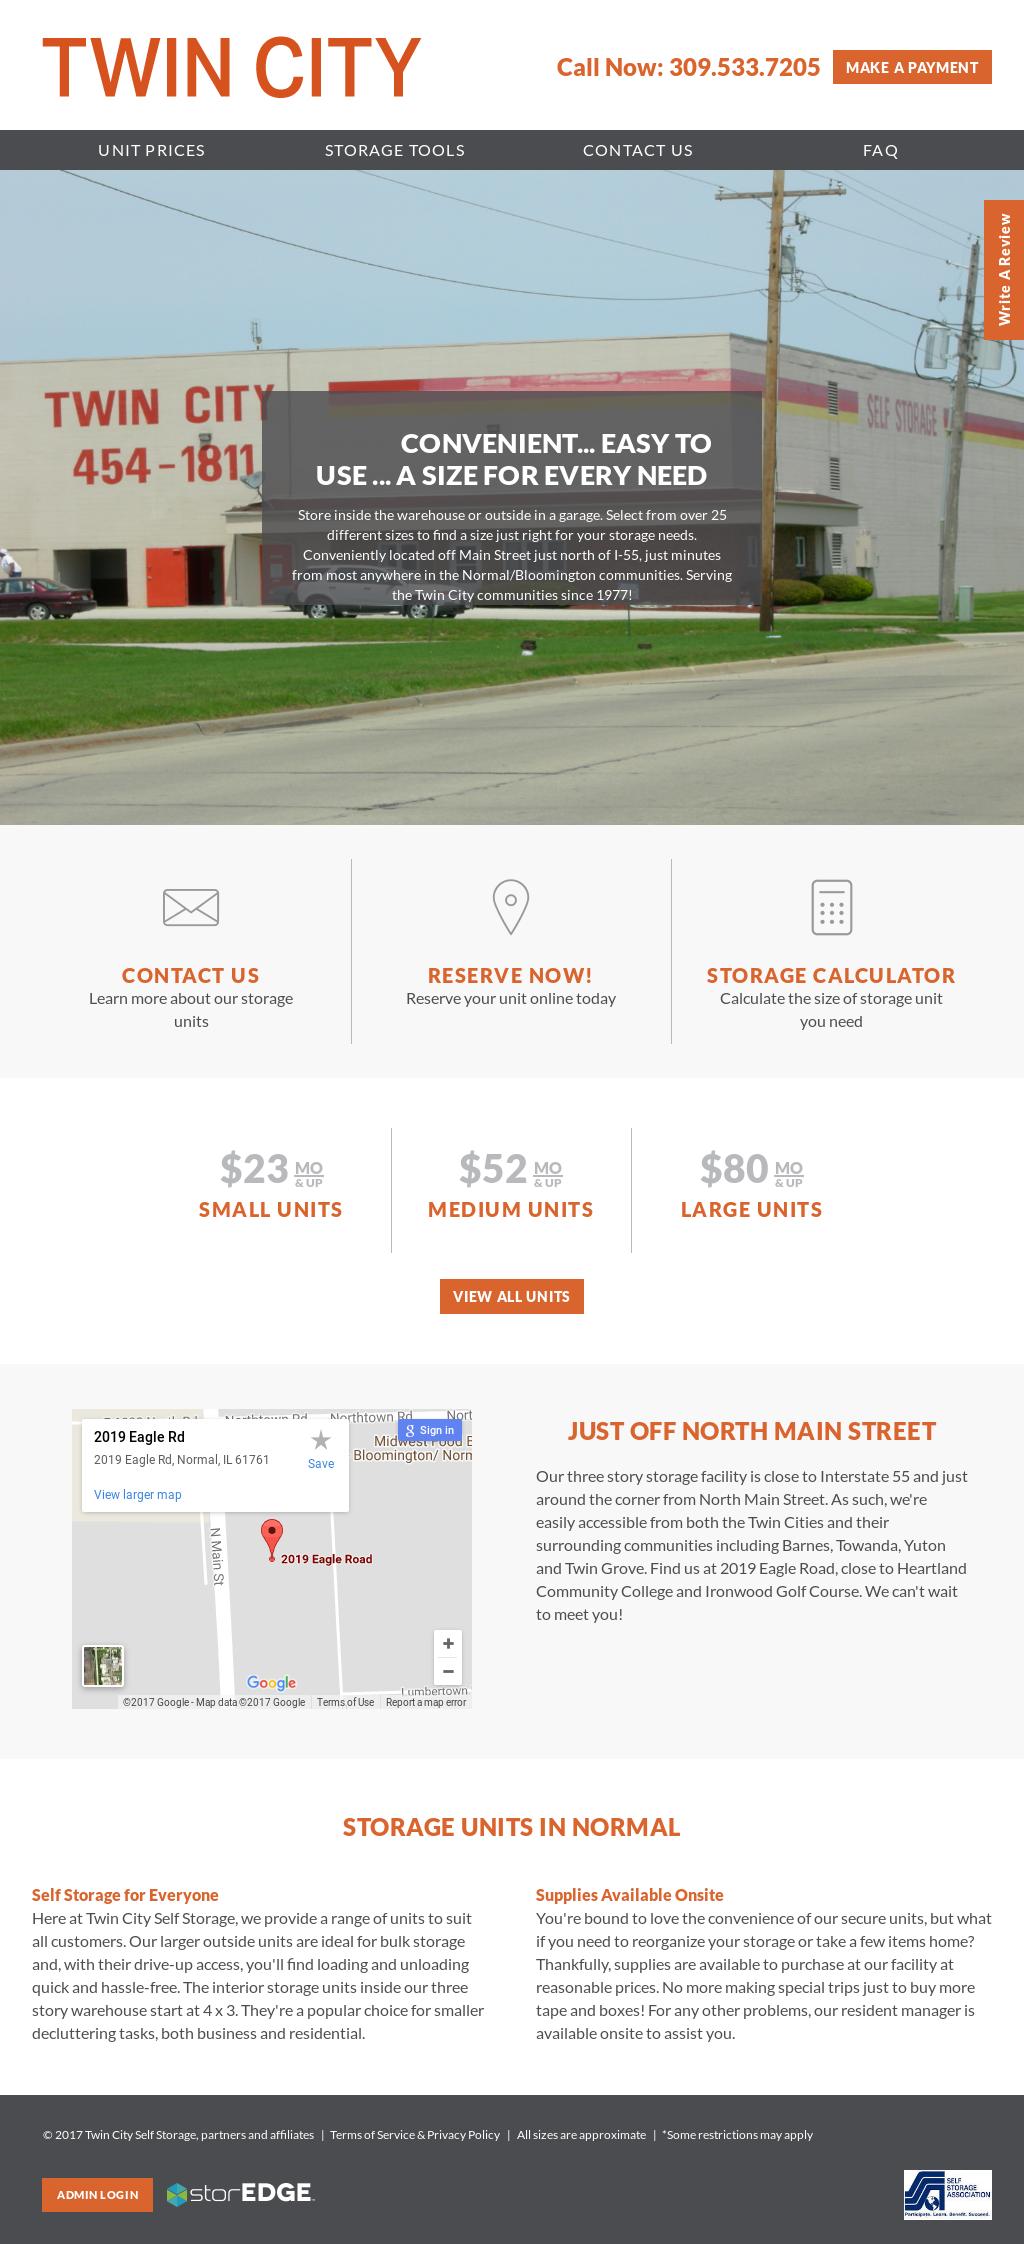 Twin City Self Storage Website History